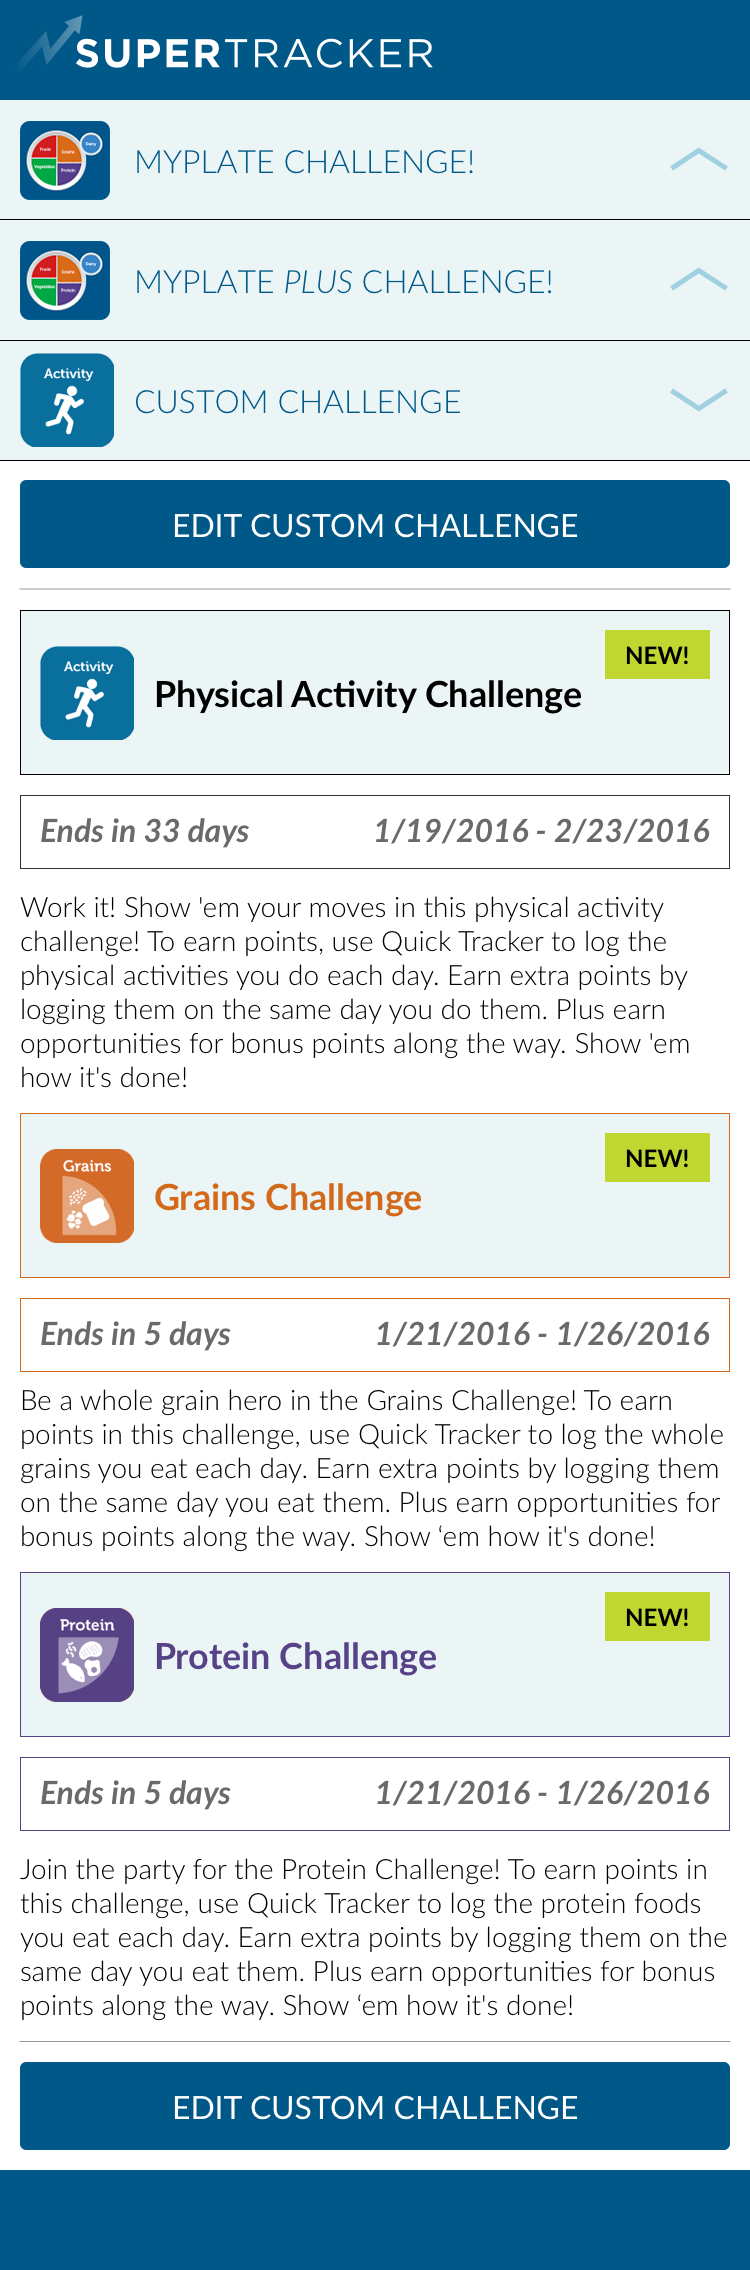 Custom - Main Group > Challenges